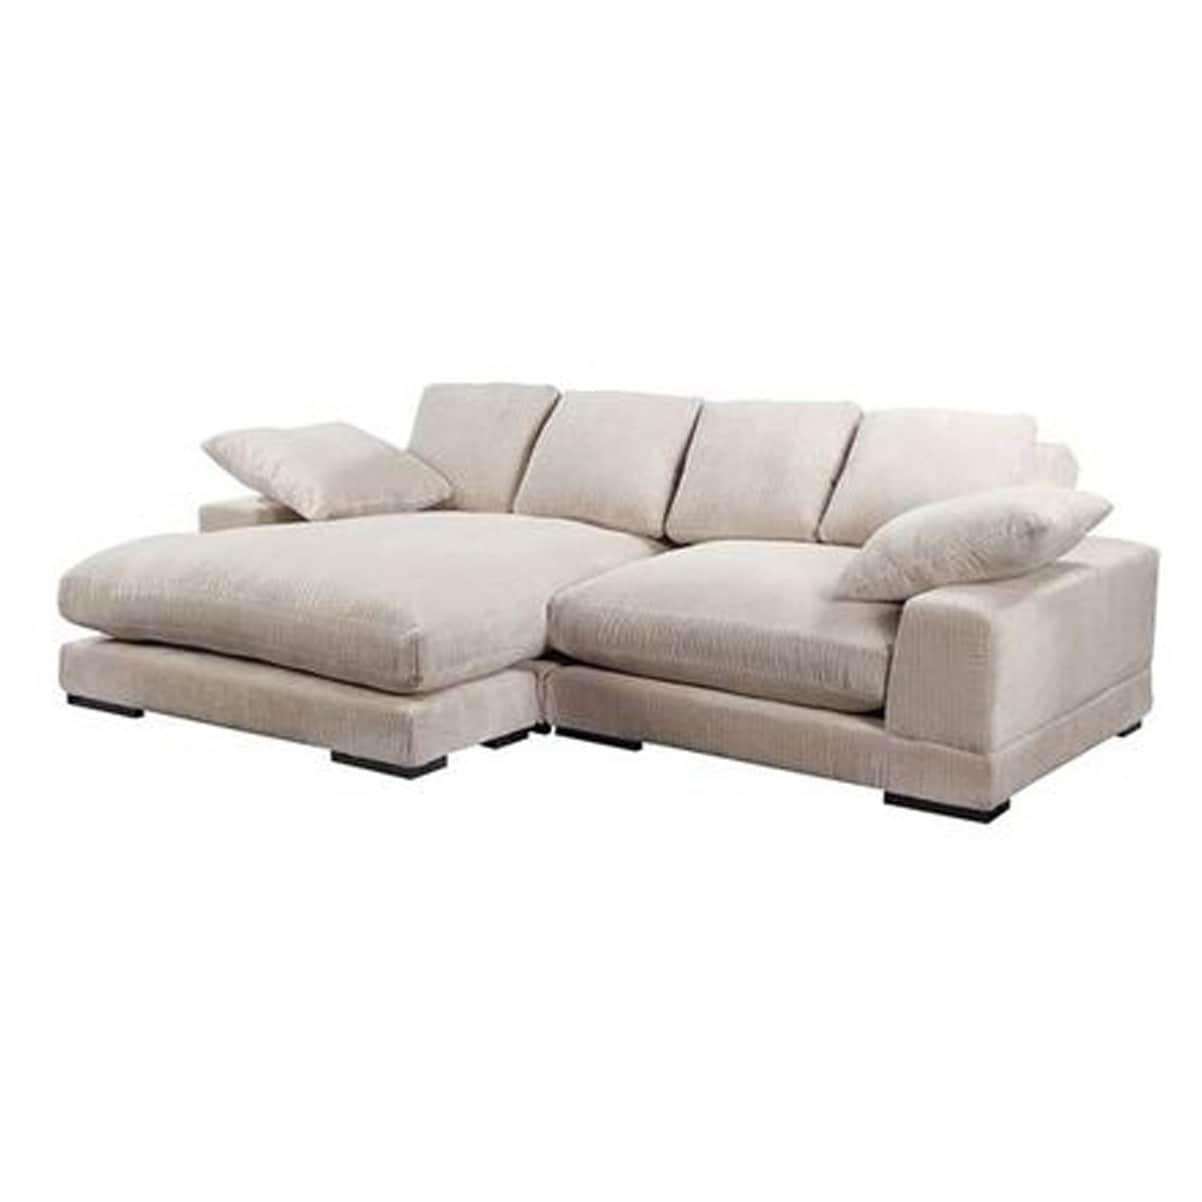 Astounding Aurelle Home Reversible Deep Seat Contemporary Sectional Sofa Unemploymentrelief Wooden Chair Designs For Living Room Unemploymentrelieforg